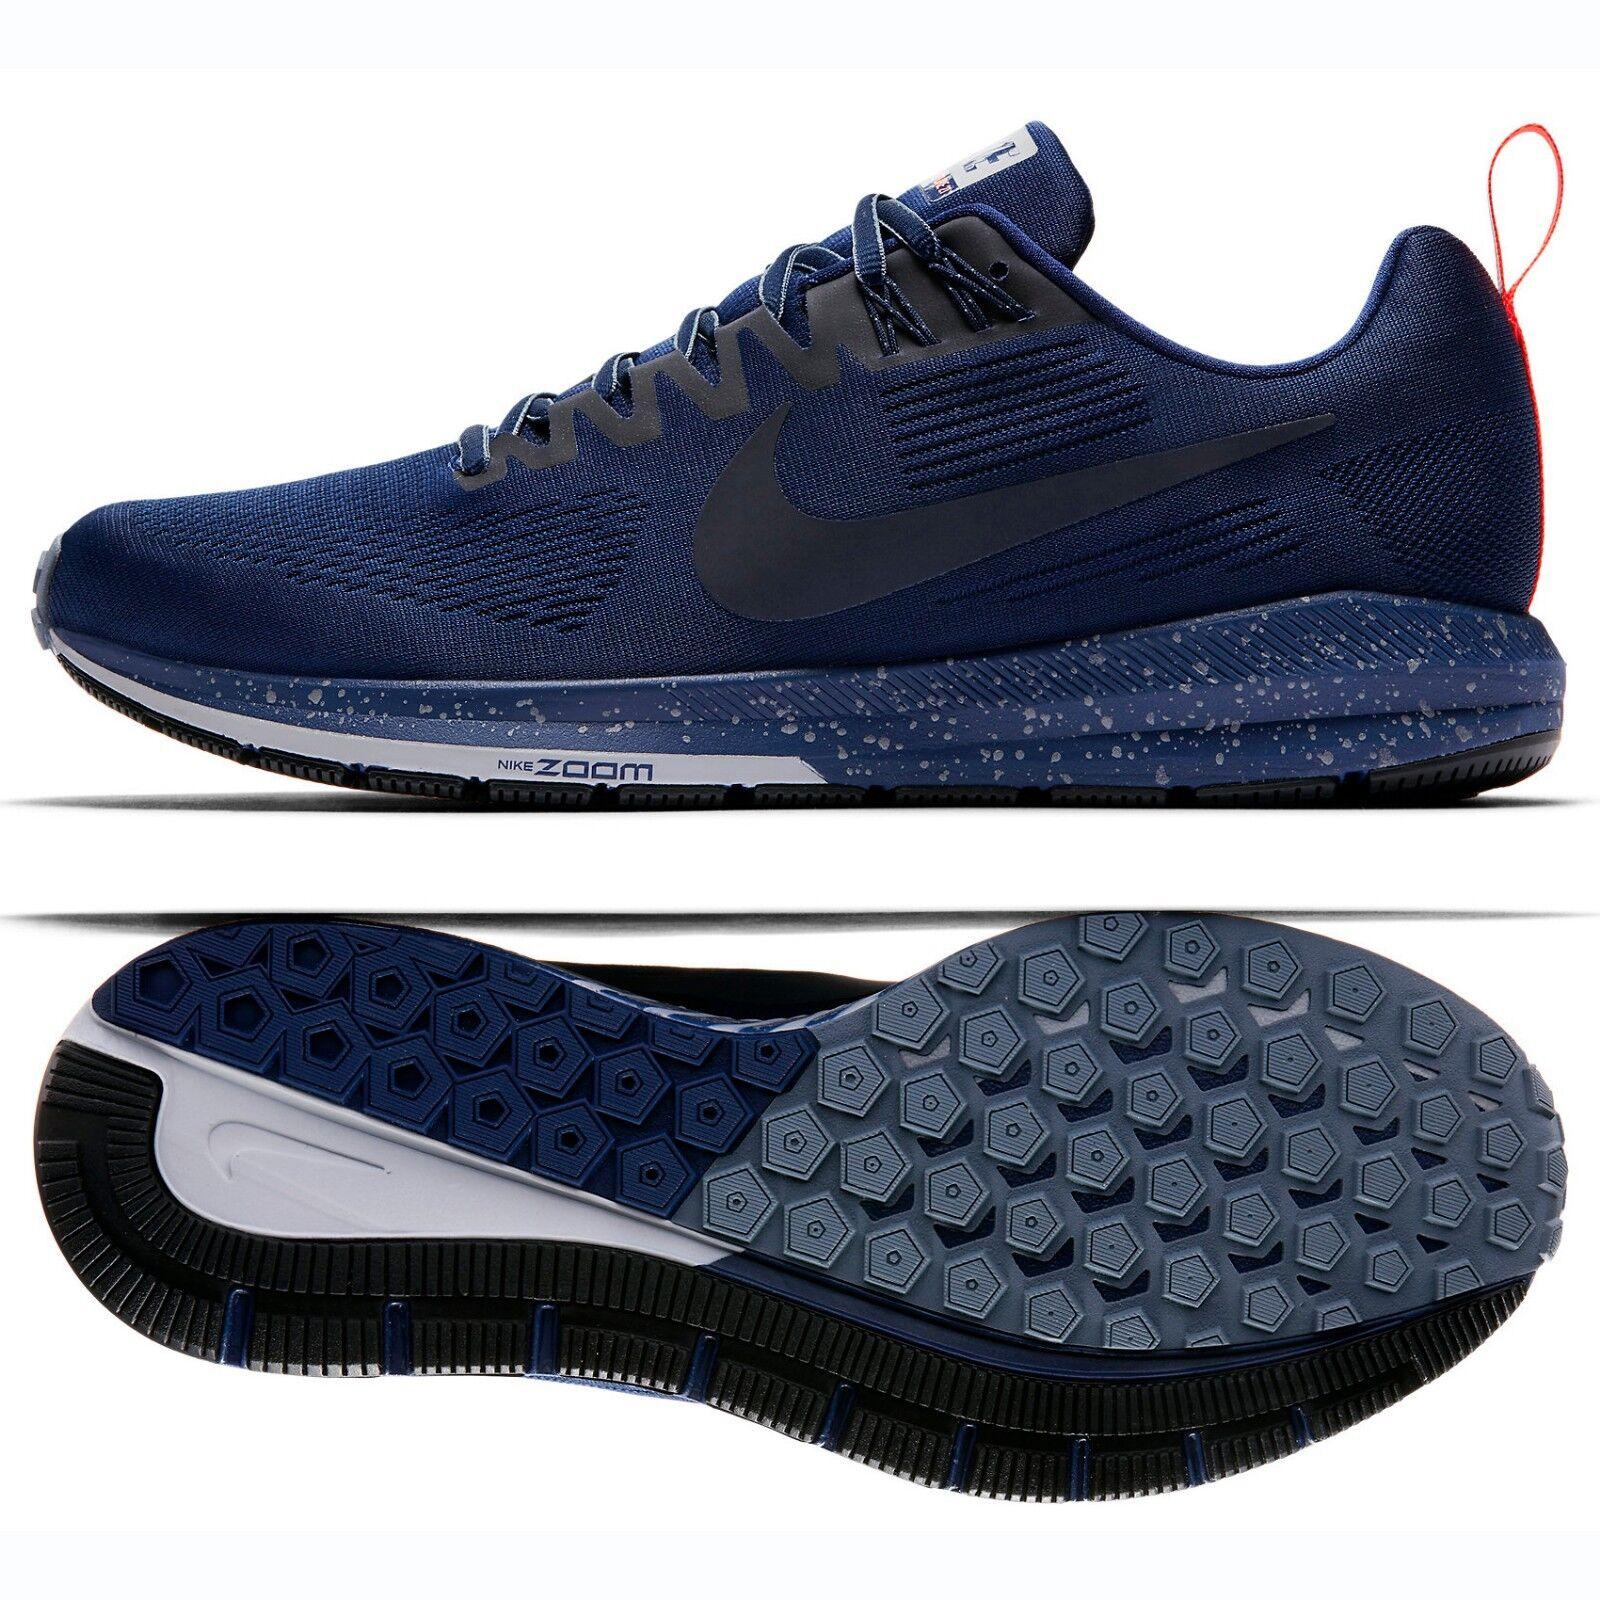 sale retailer 6560f d121a Nike Air Zoom Structure 21 escudo 907324-400 Binary Azul Azul Azul   gris  hombres